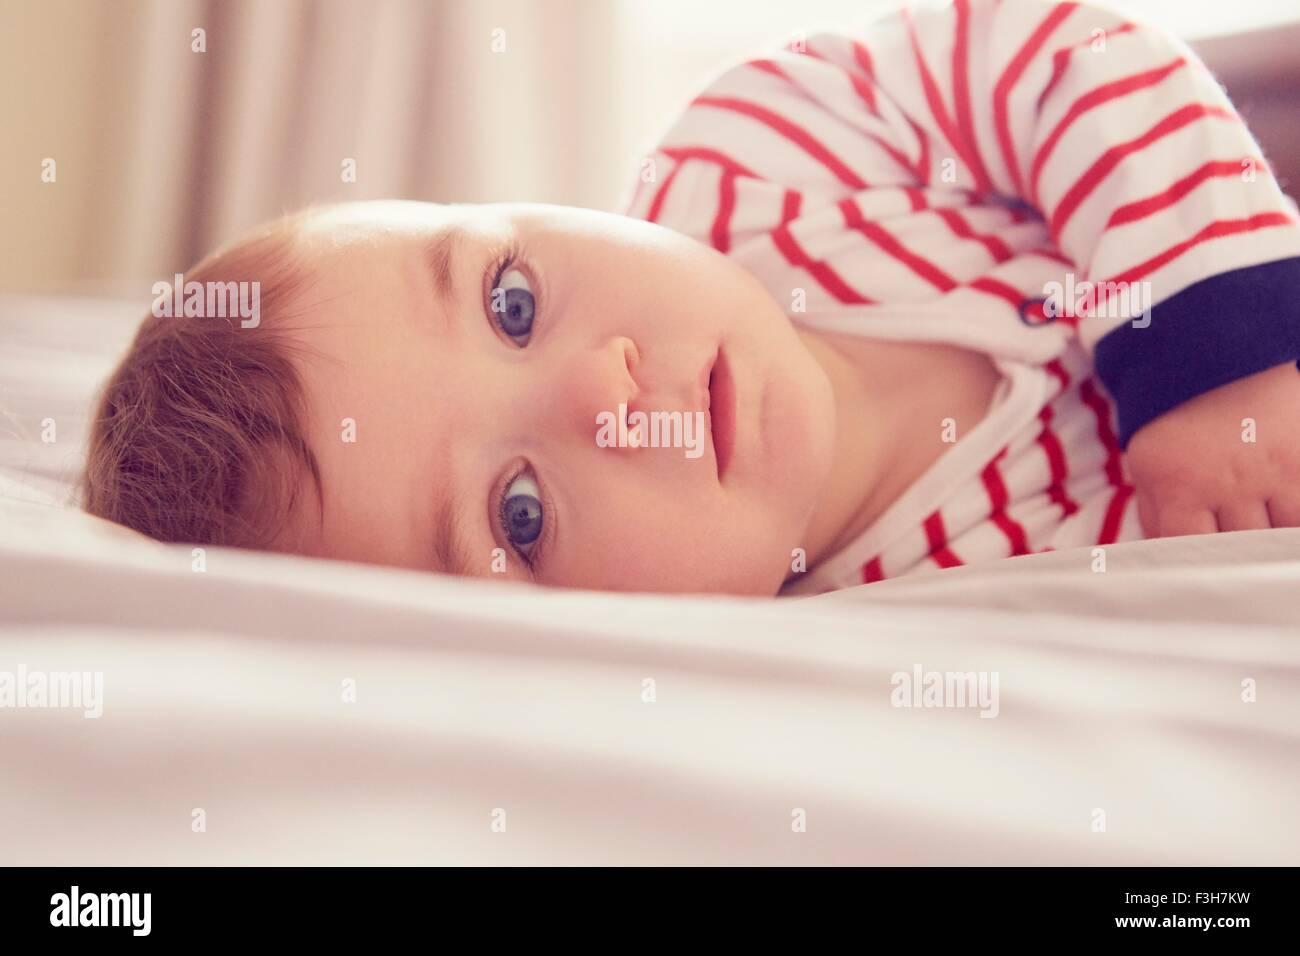 Baby boy lying on bed - Stock Image